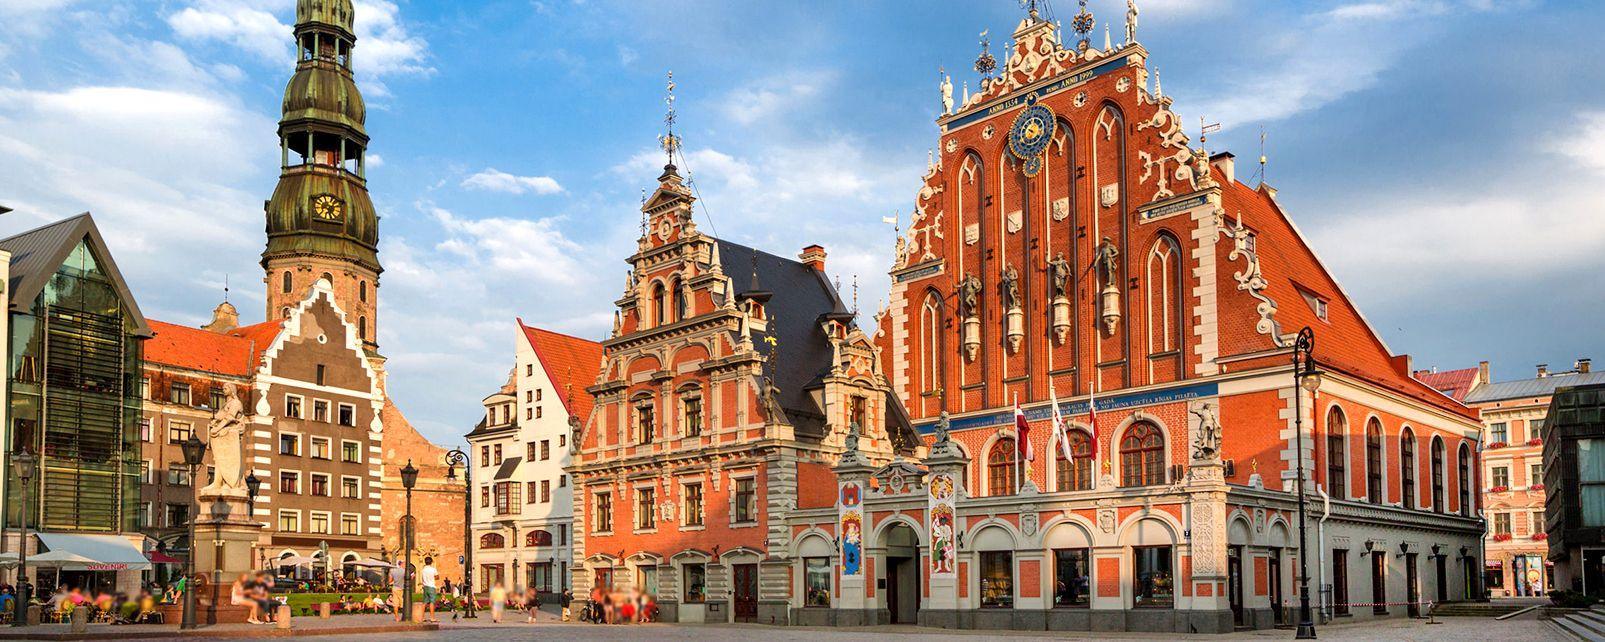 Le centre historique de Riga , Lettonie